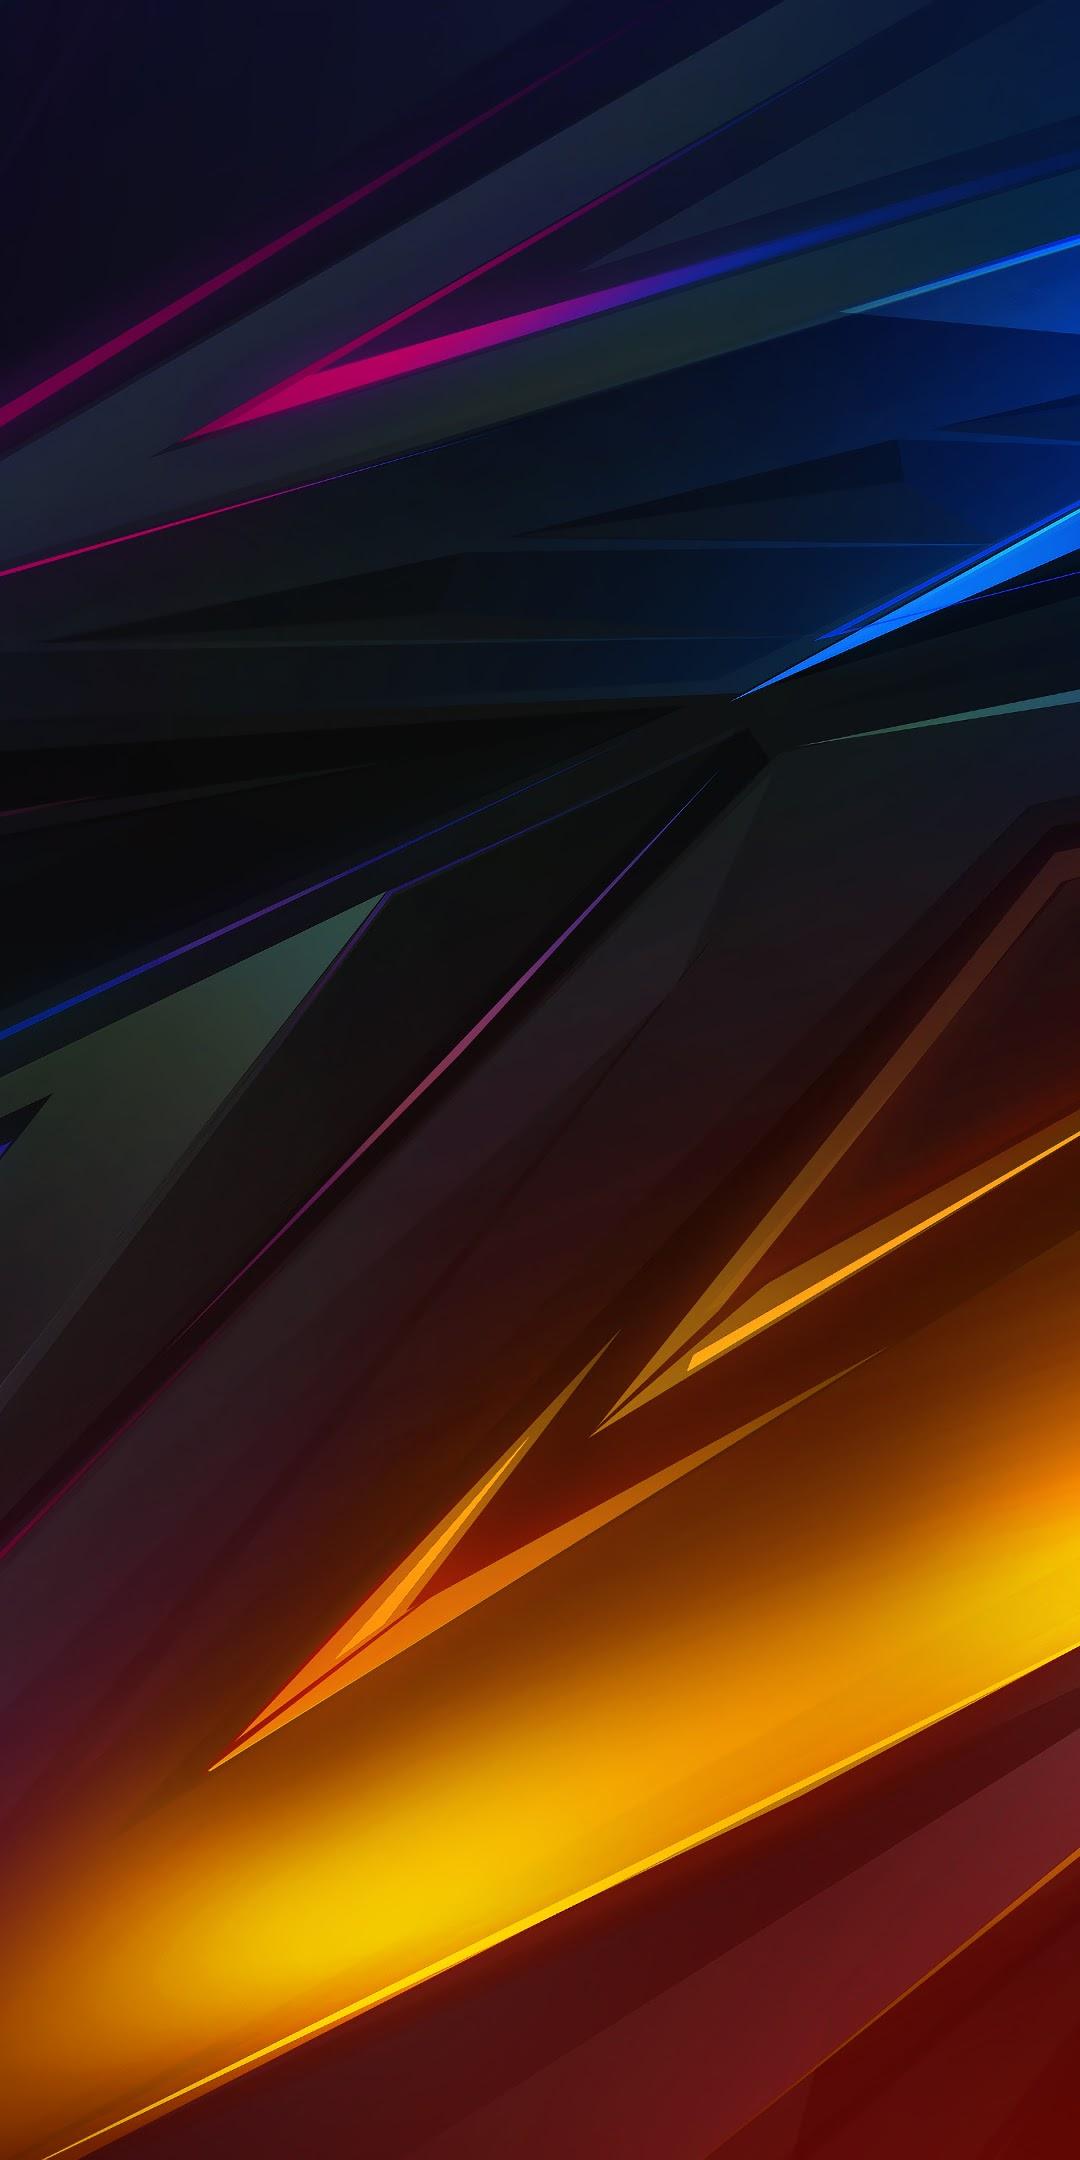 Colorful Dark Abstract Polygon 3d 4k Wallpaper 39